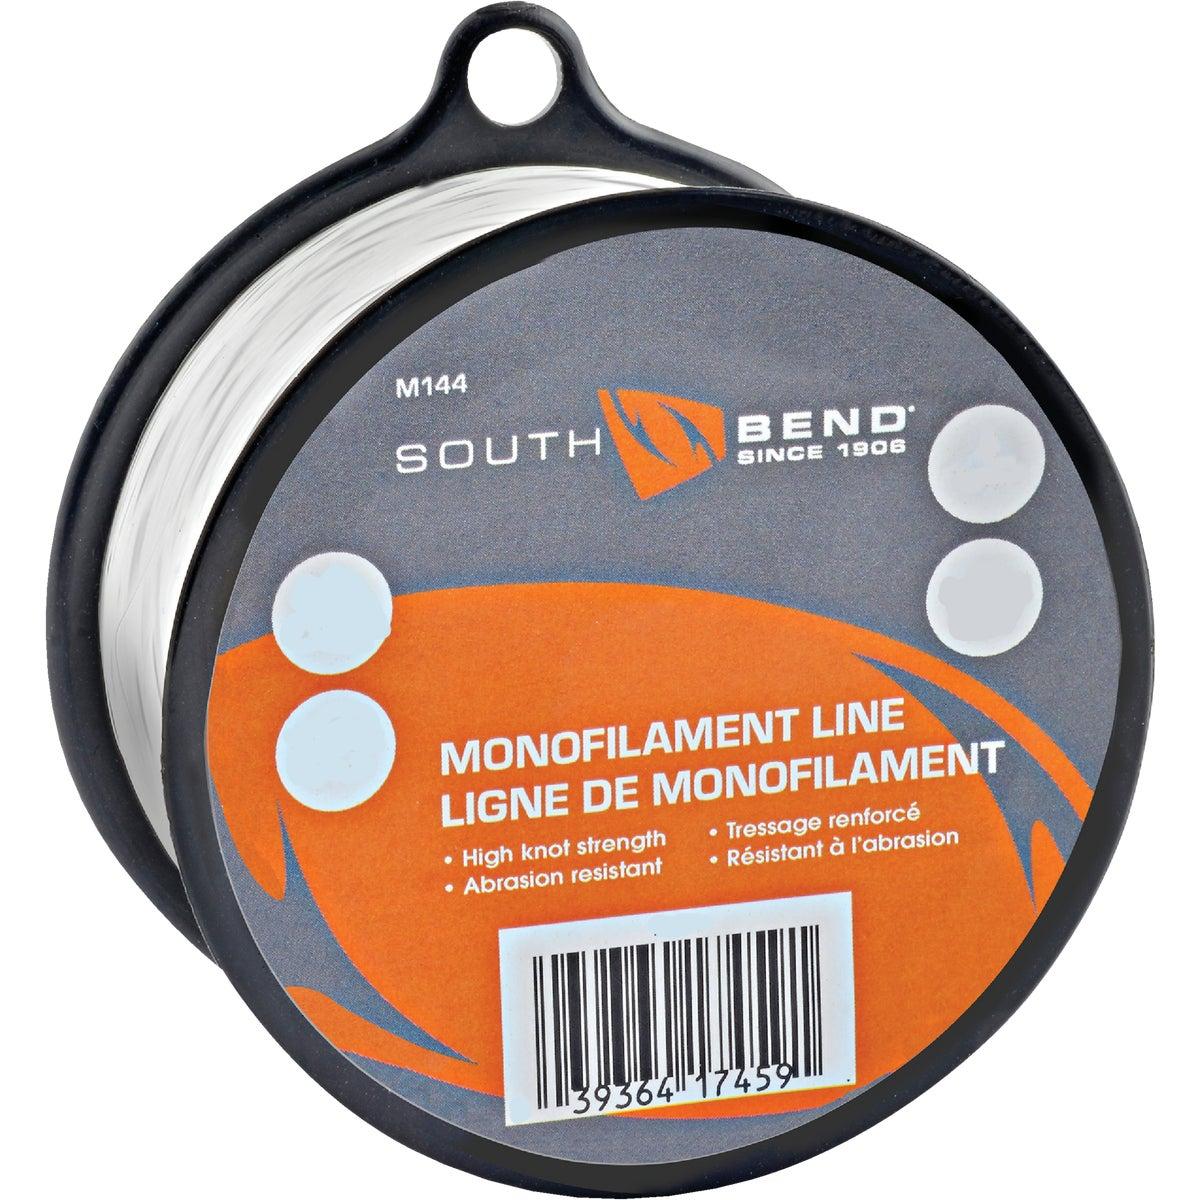 South Bend Sporting Goods 12LB 500YD MONO LINE M1412